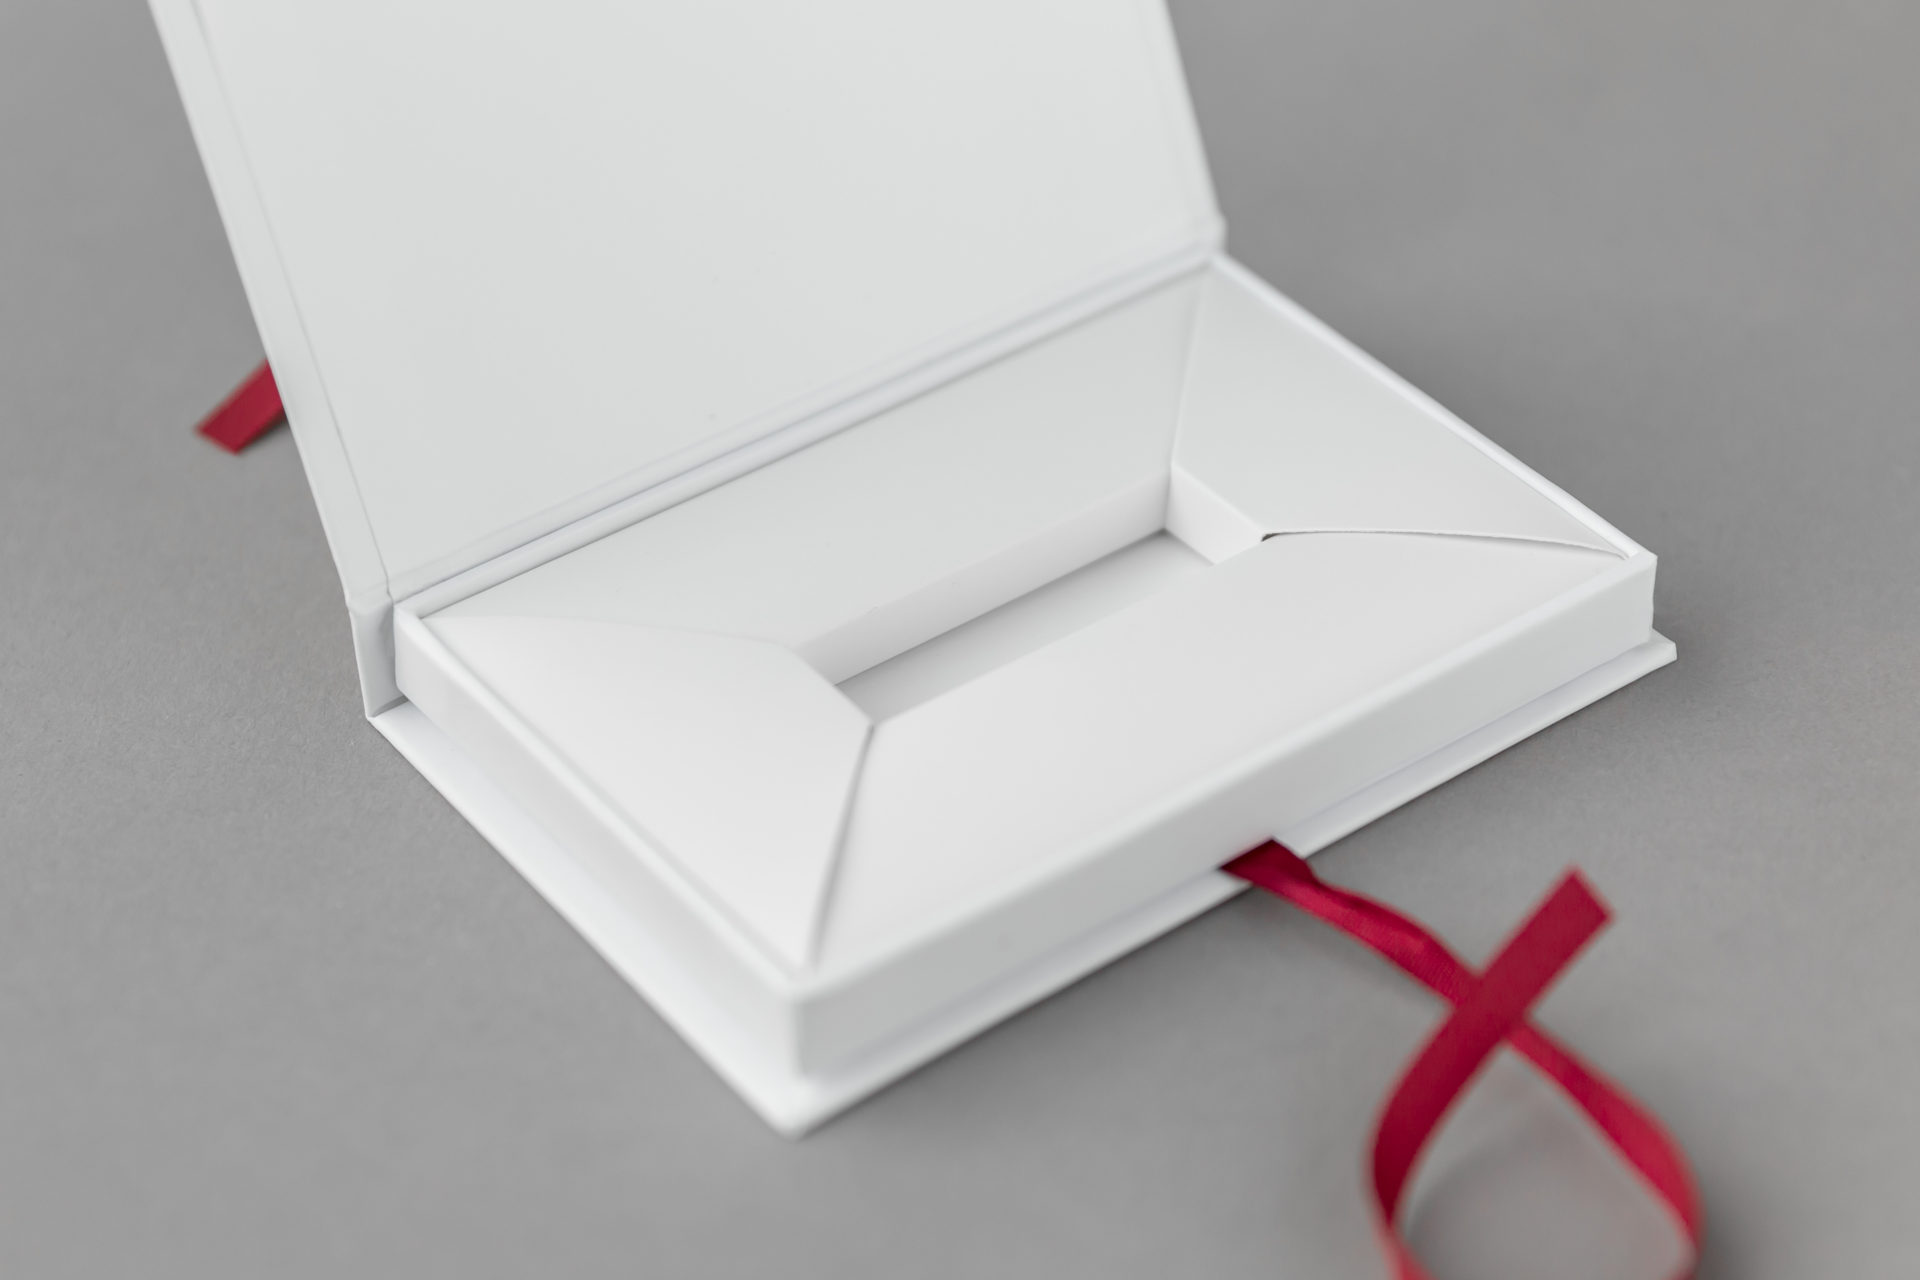 Herinneringsdoosje met lintsluiting tbv USB-stick